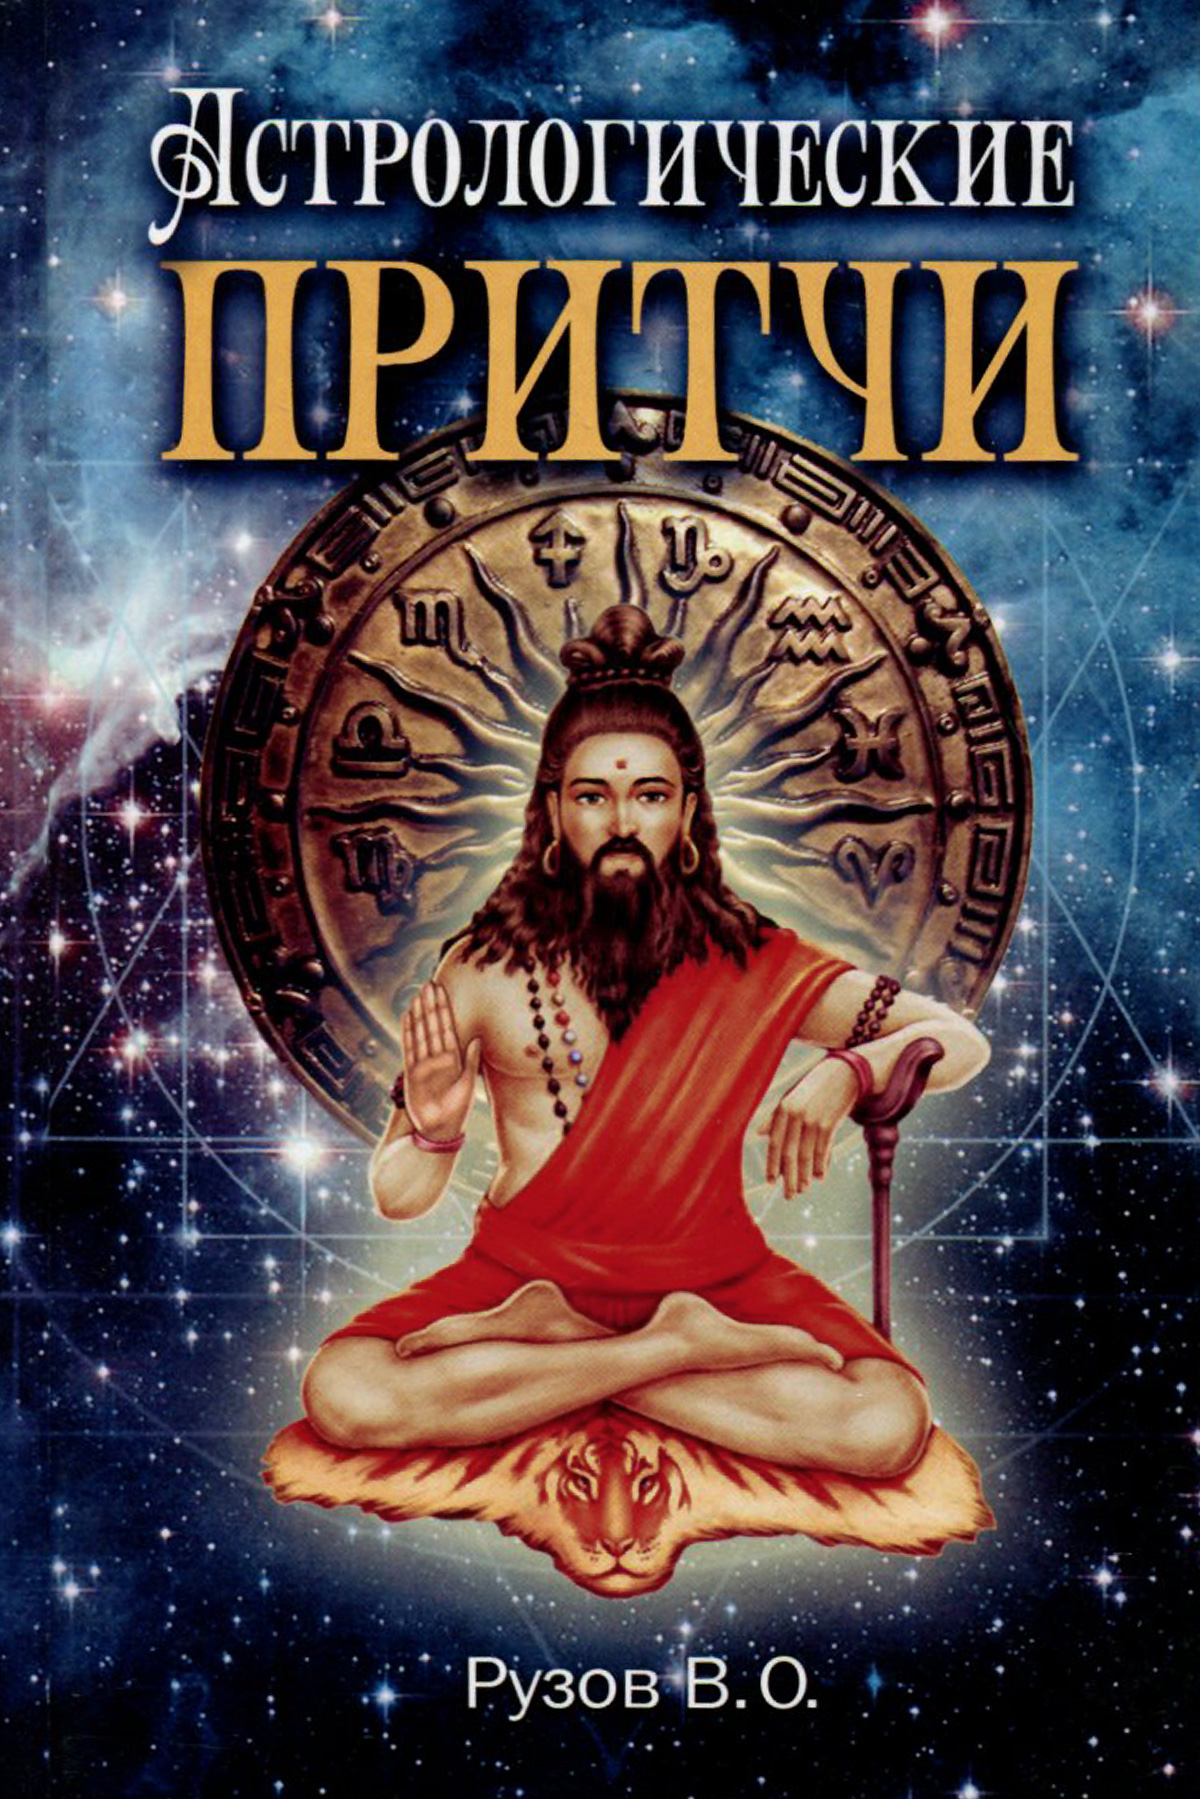 Астрологические притчи, В. О. Рузов